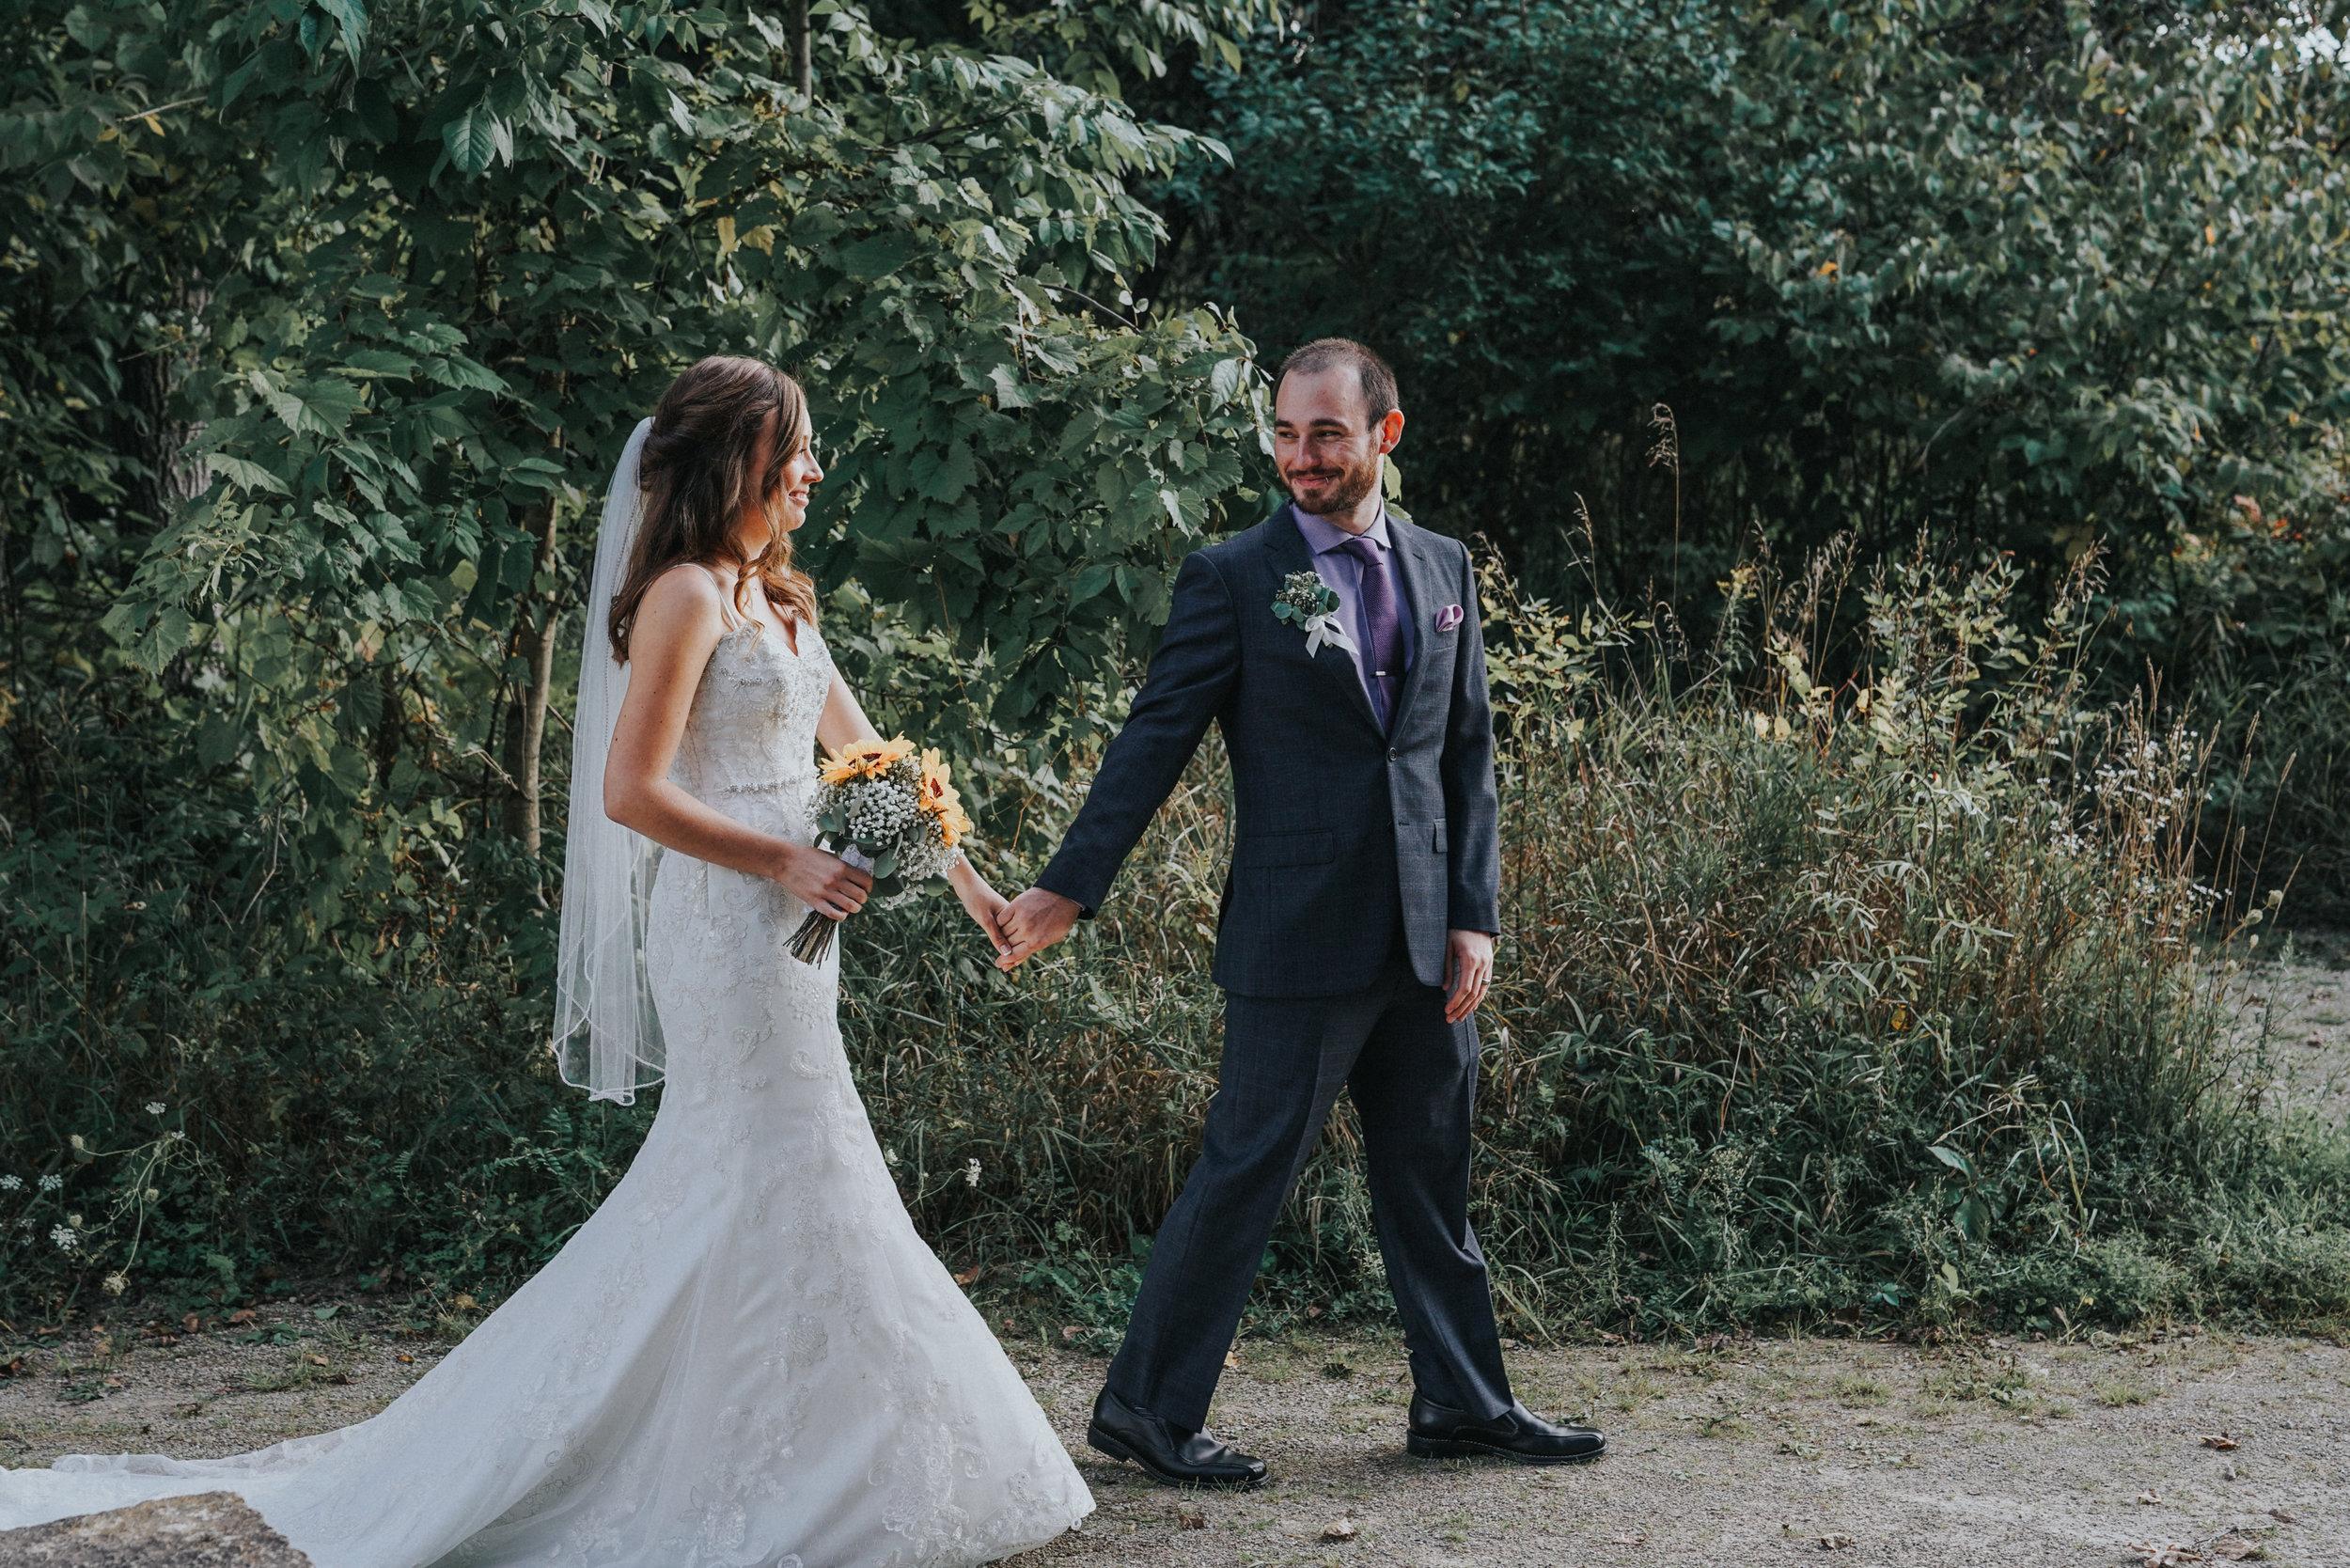 Fall wedding at Indian Springs Metropark